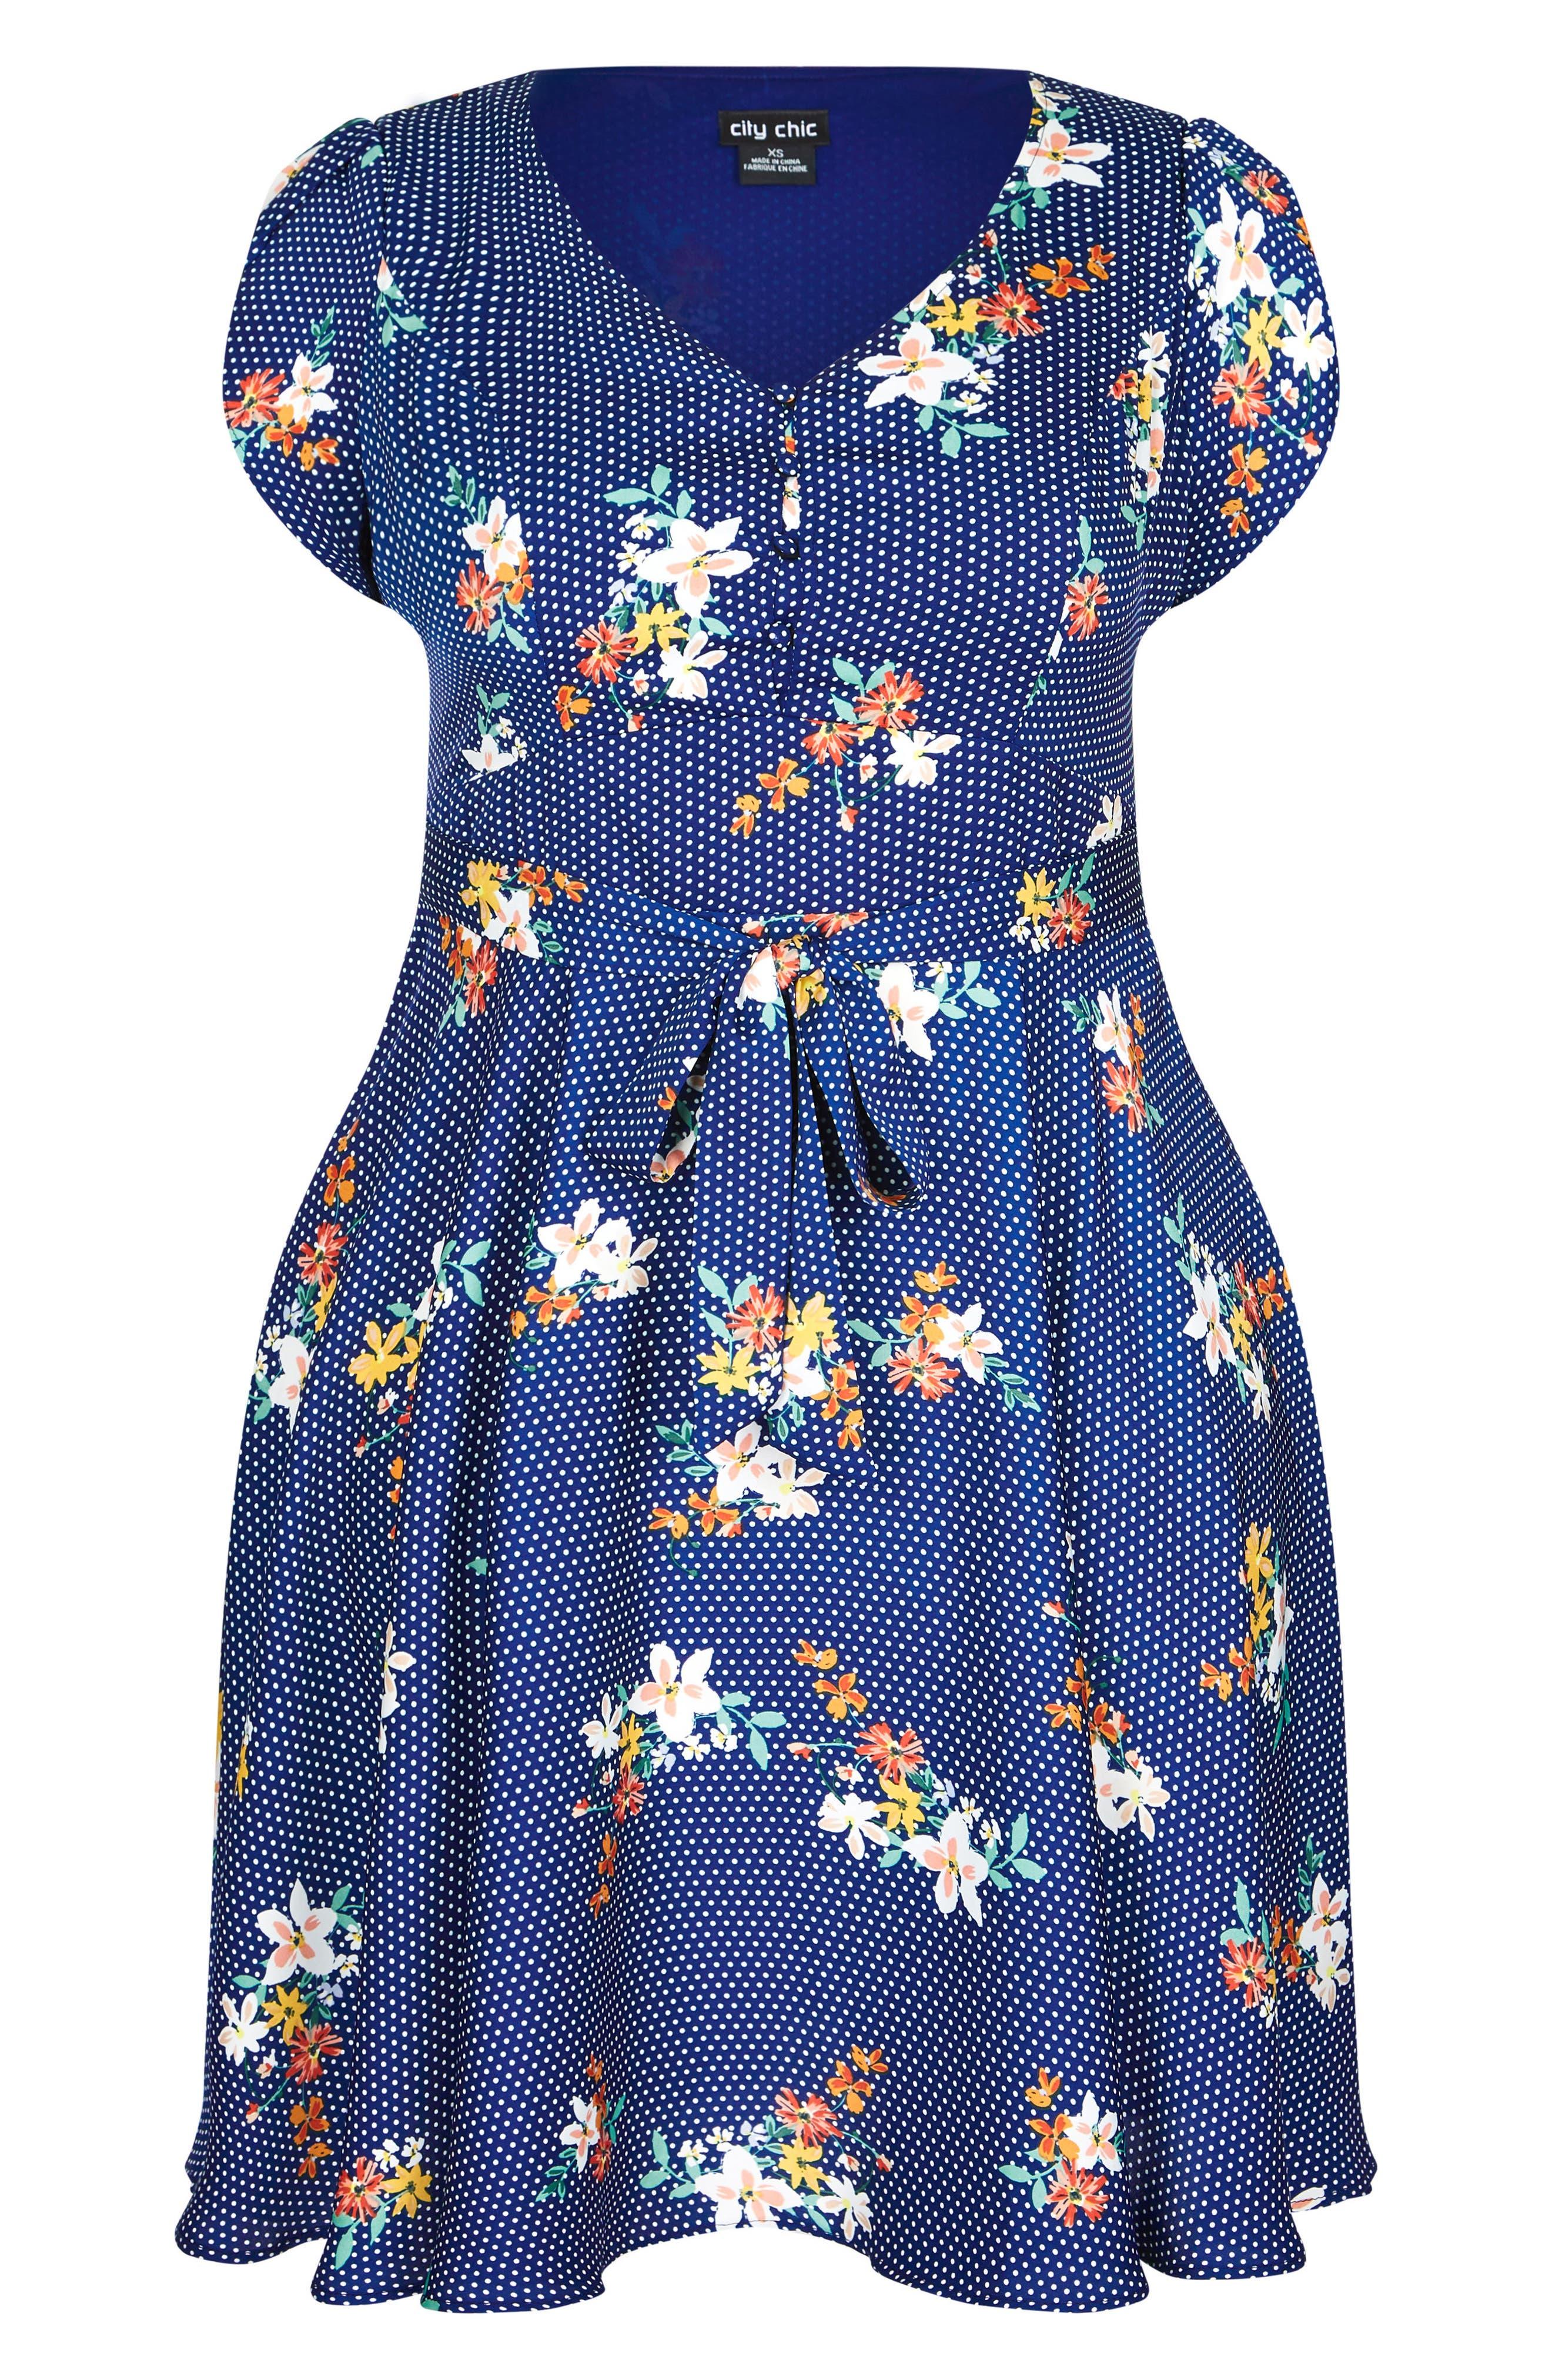 Sweet Spot Floral Fit & Flare Dress,                             Alternate thumbnail 3, color,                             Spot The Floral